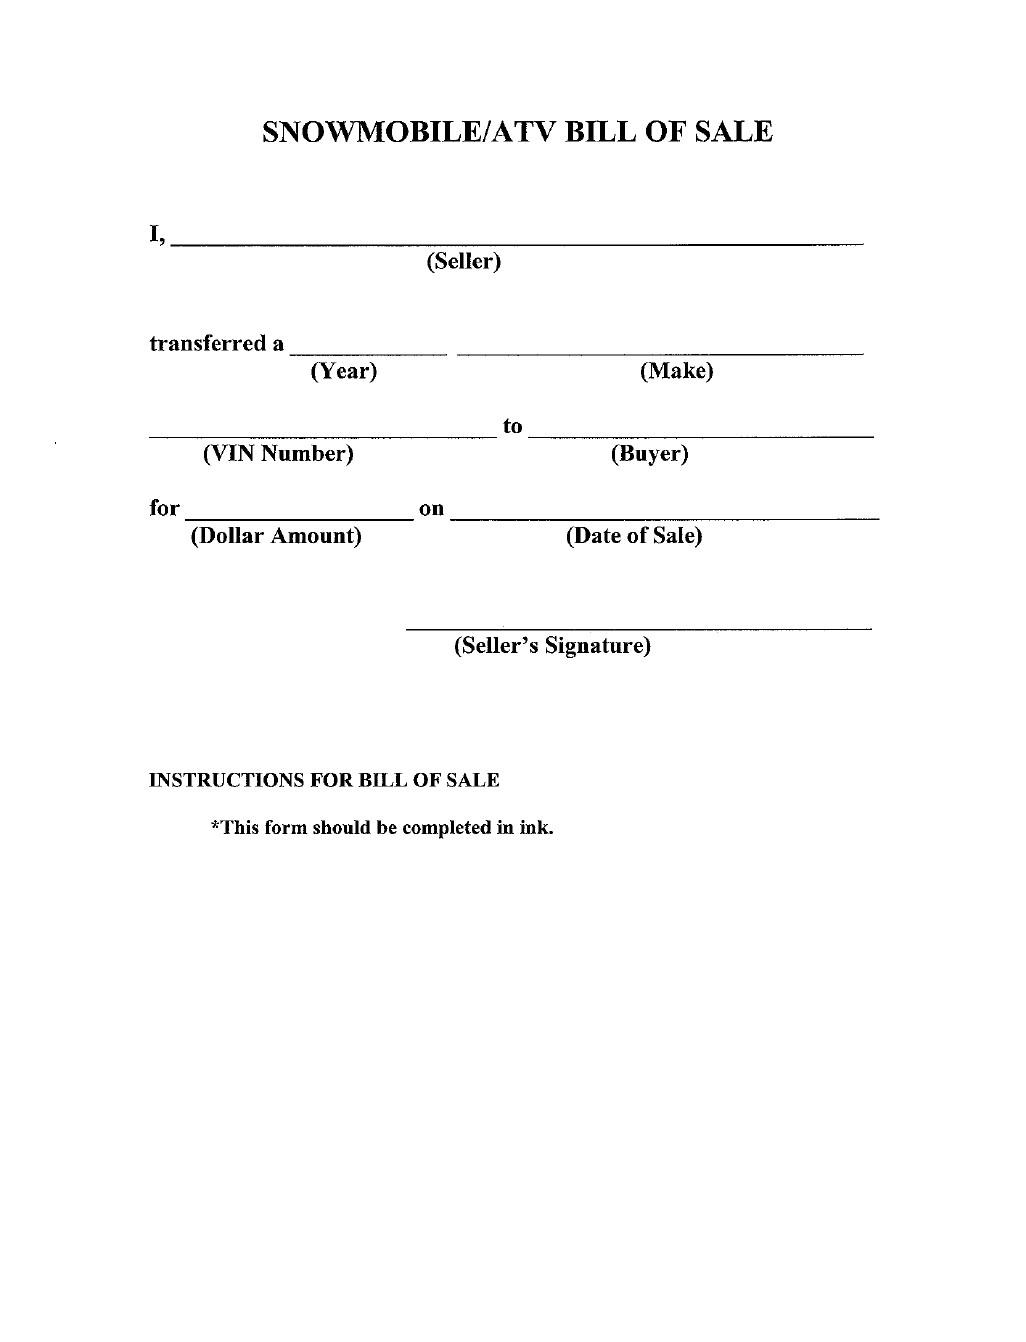 free snowmobile or atv bill of sale form iowa